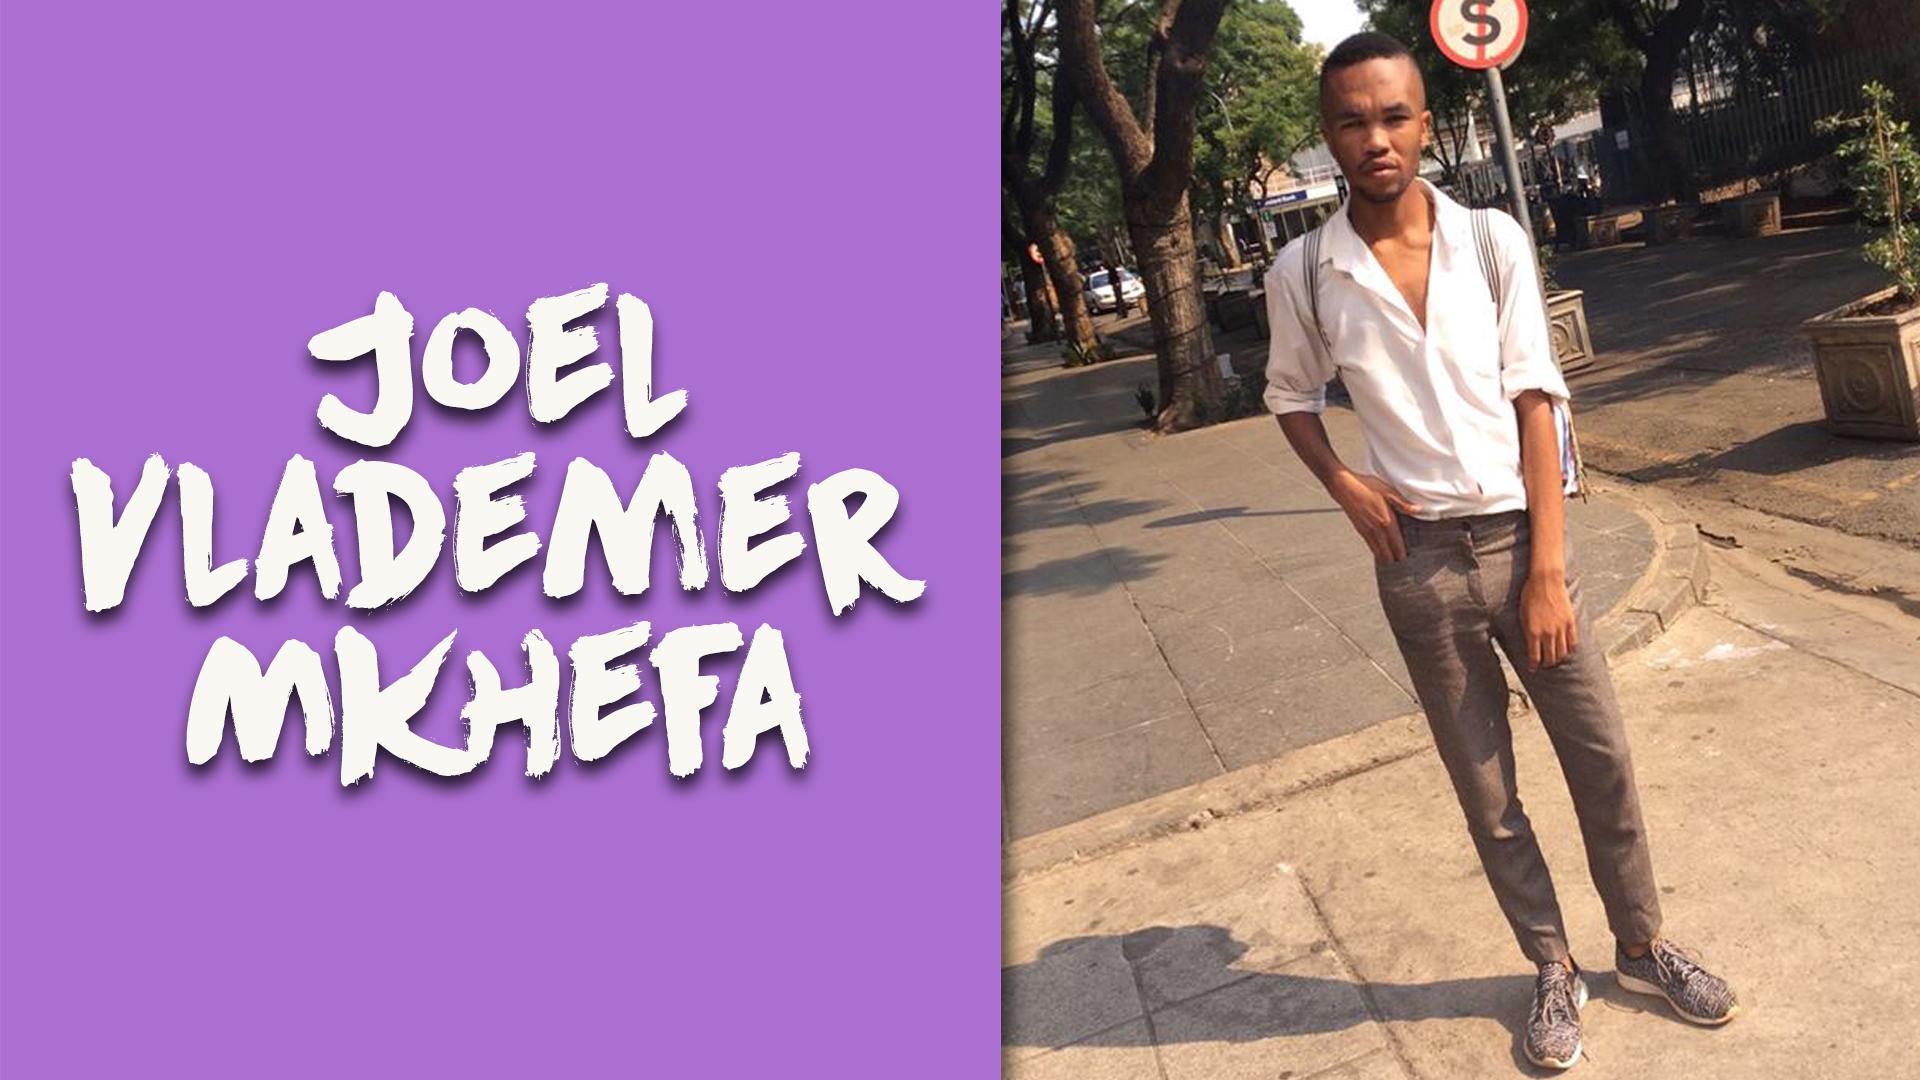 Joel Vlademer Mkhefa